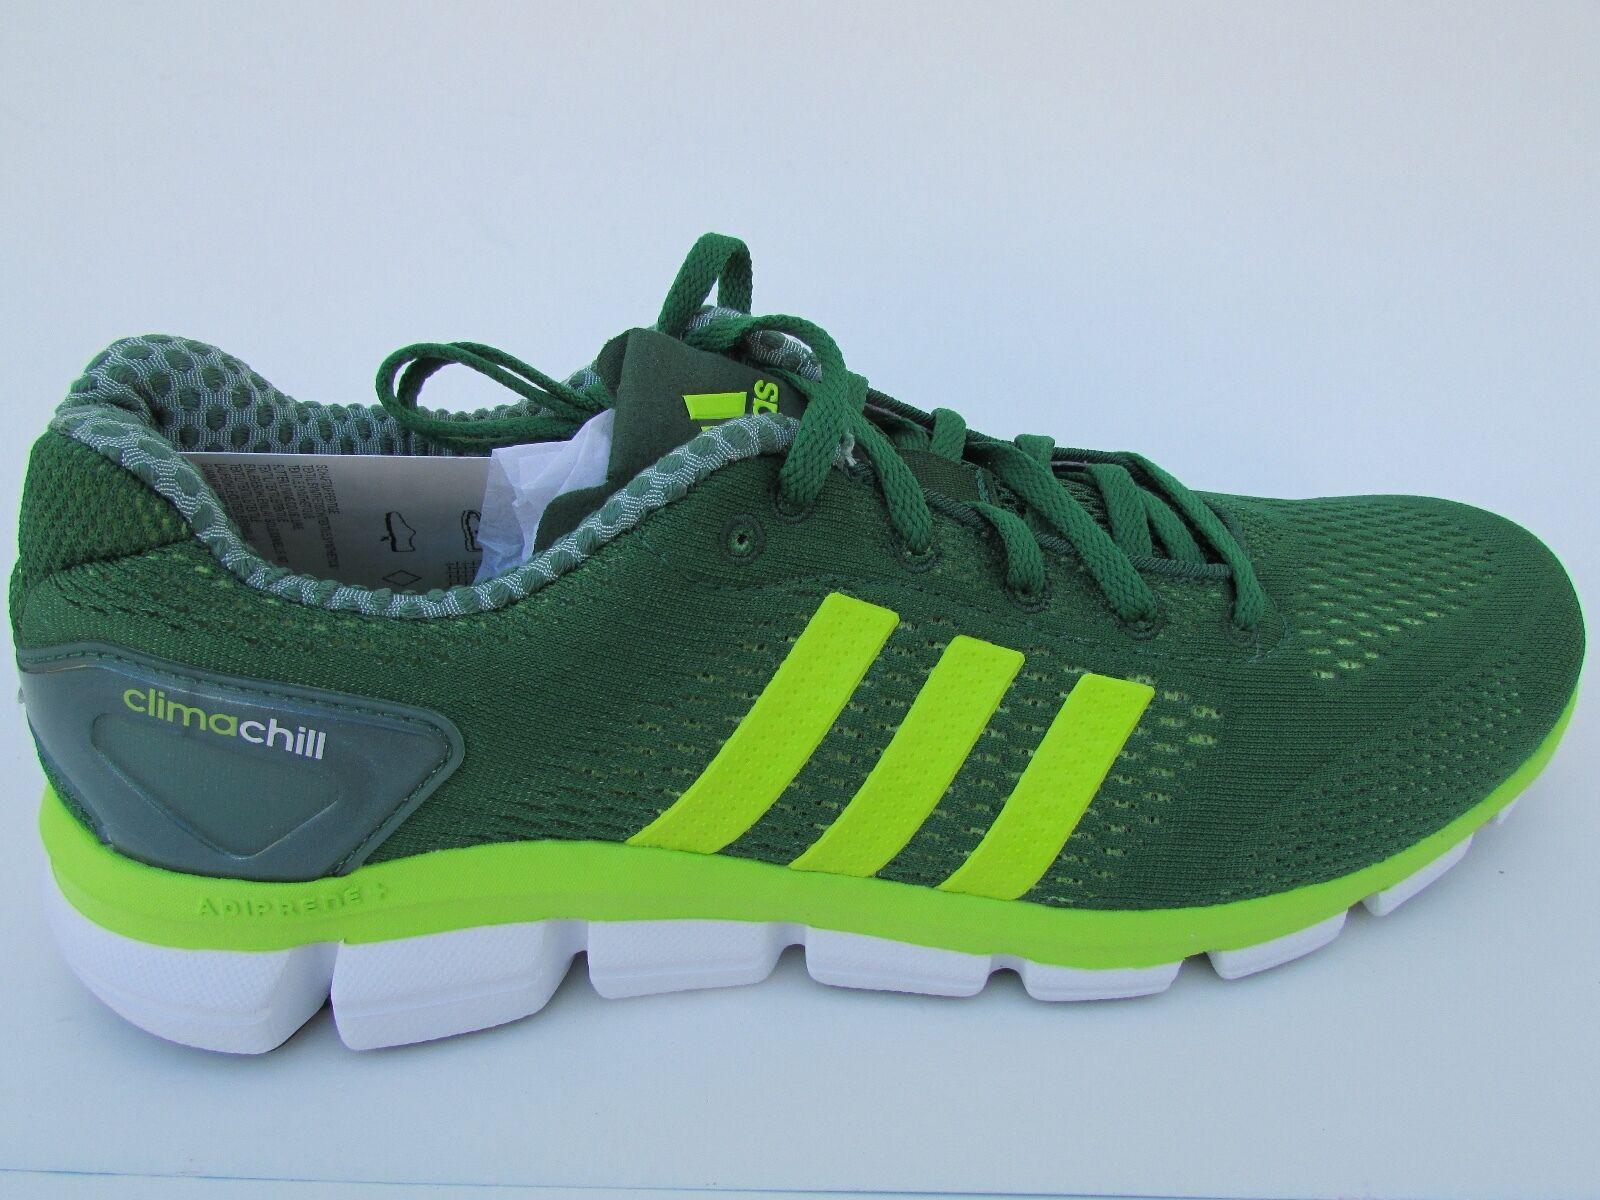 finest selection b7b57 9f7e0 new style adidas hombre cc 32504 ride running zapatos f 32504 cc baratos  zapatos de mujer